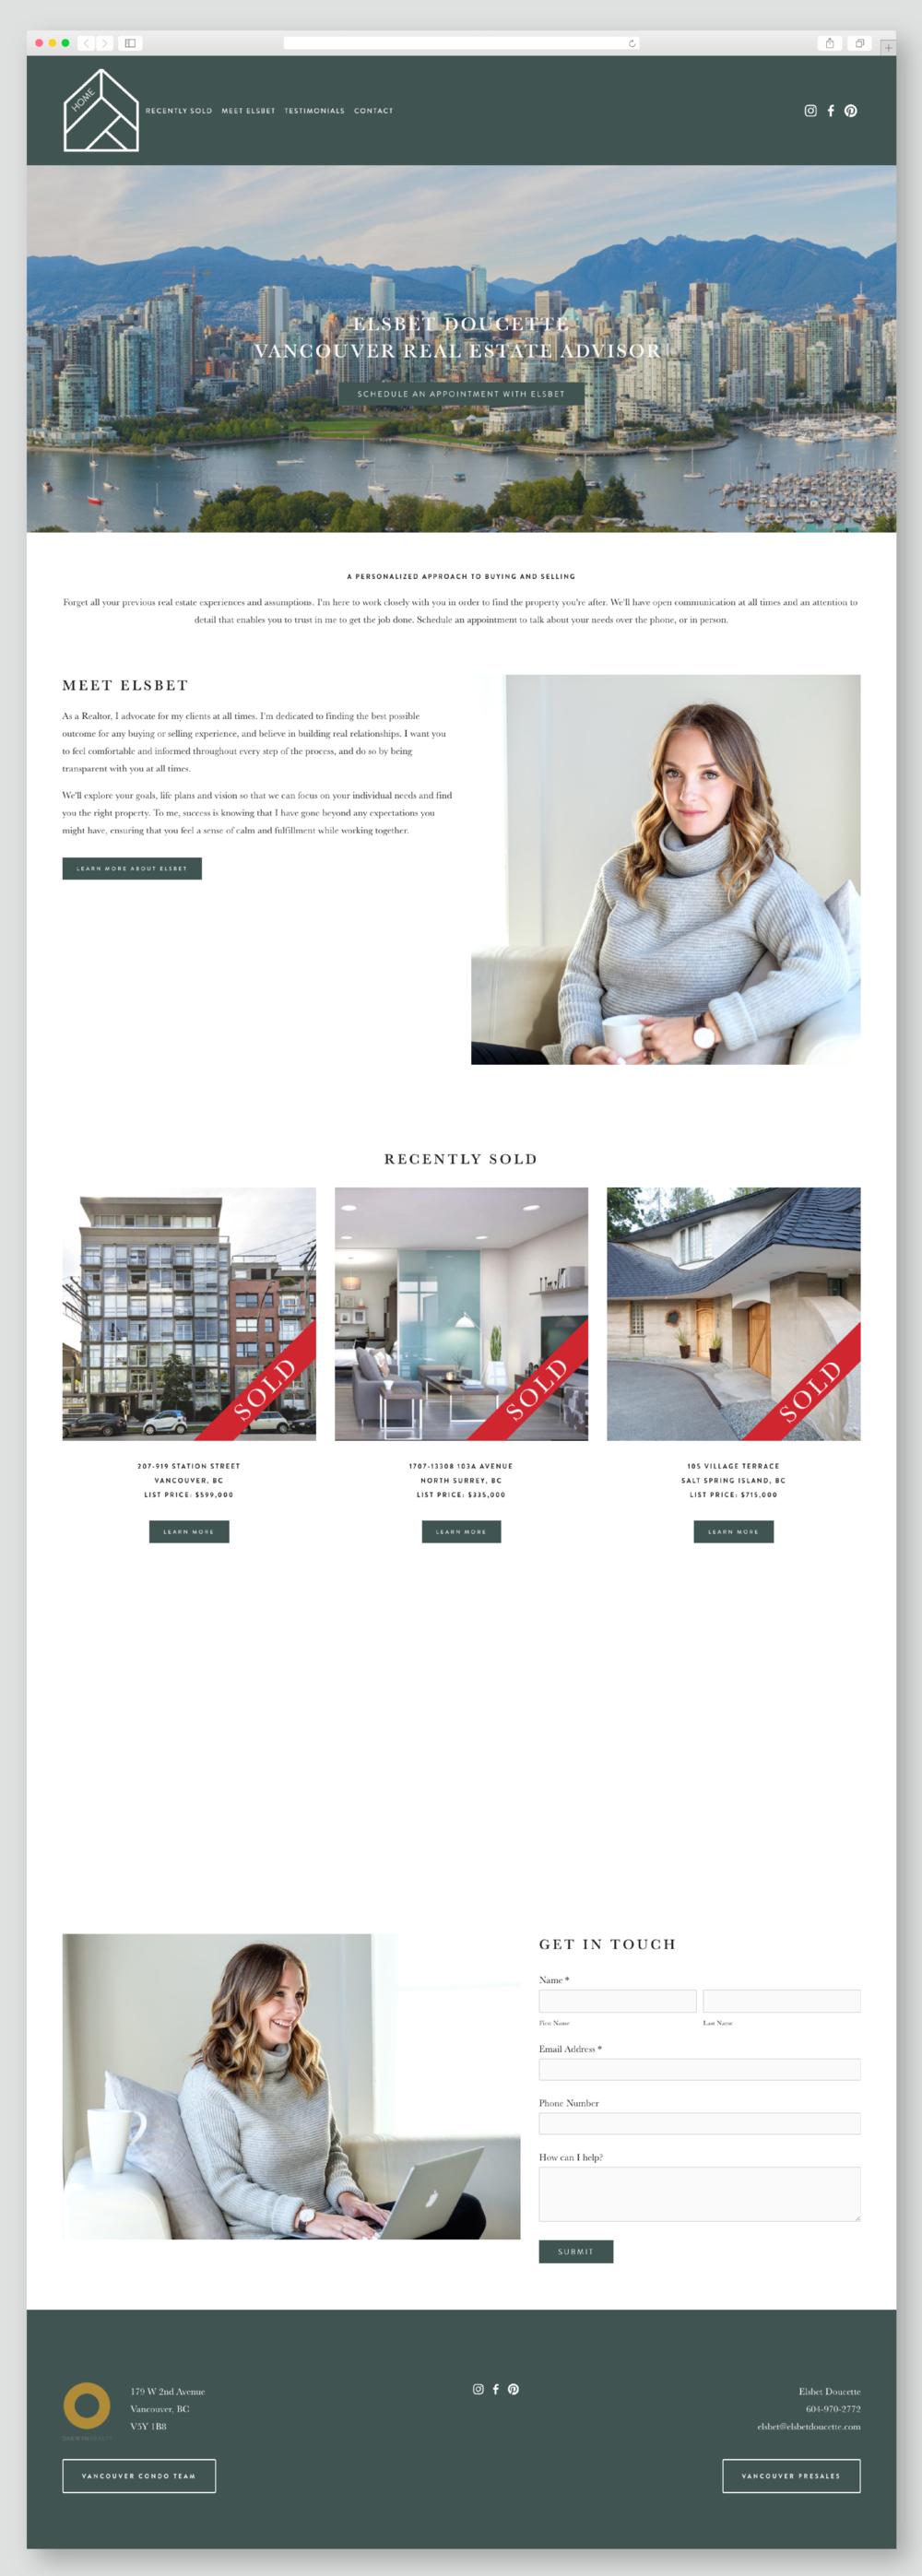 Elsbet Doucette Realty's Squarespace website training